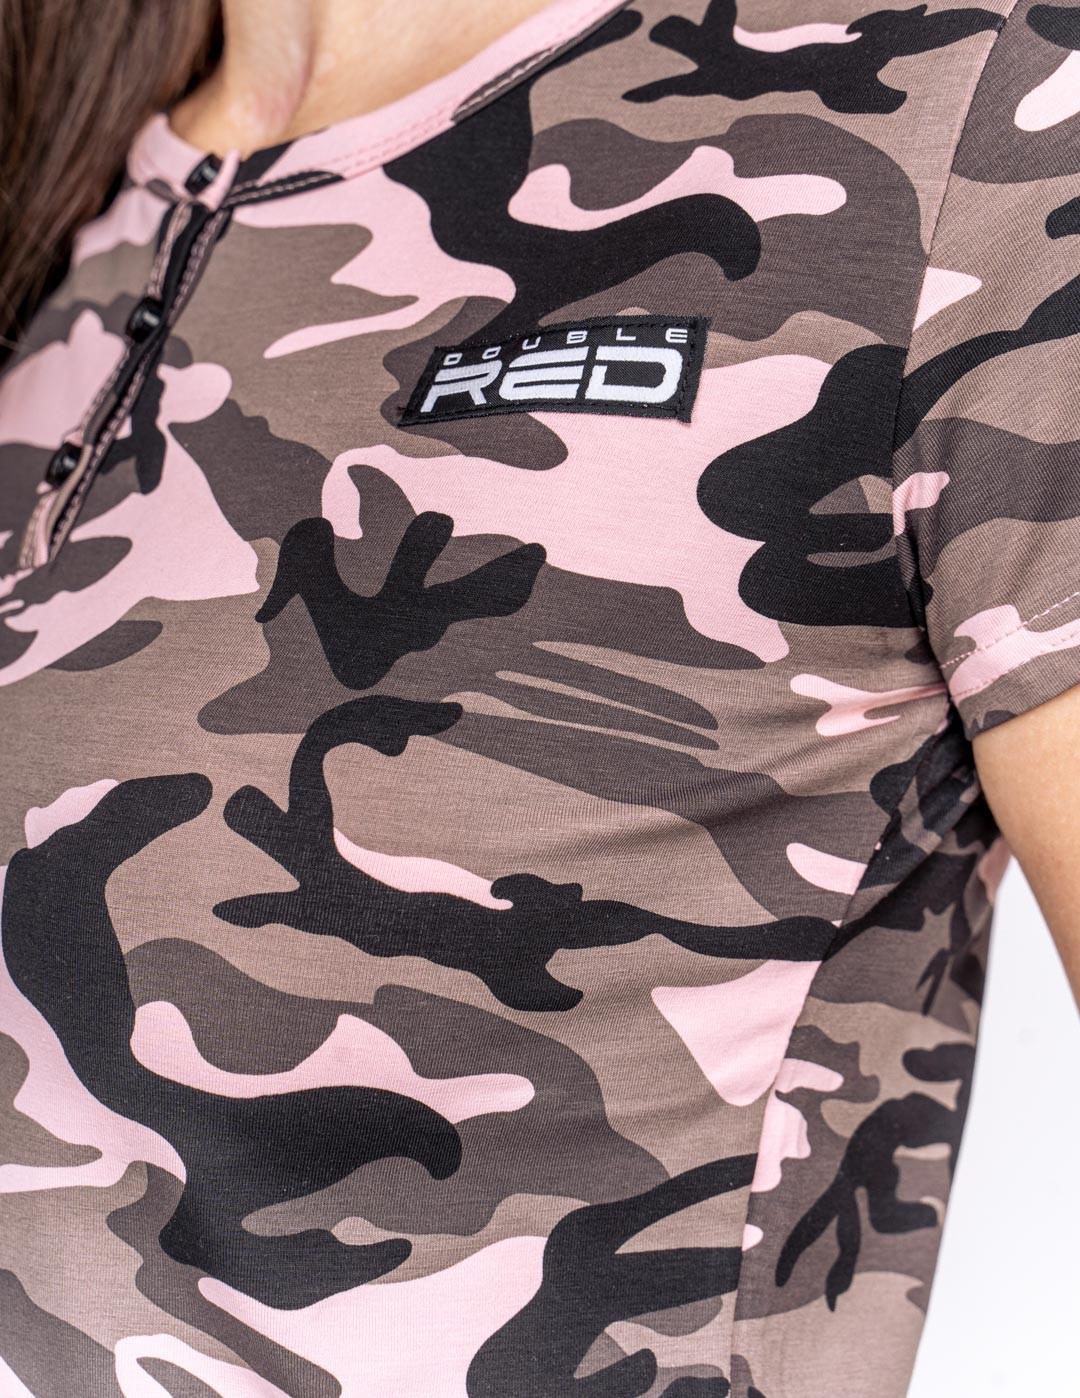 T-Shirt Camodresscode Pink